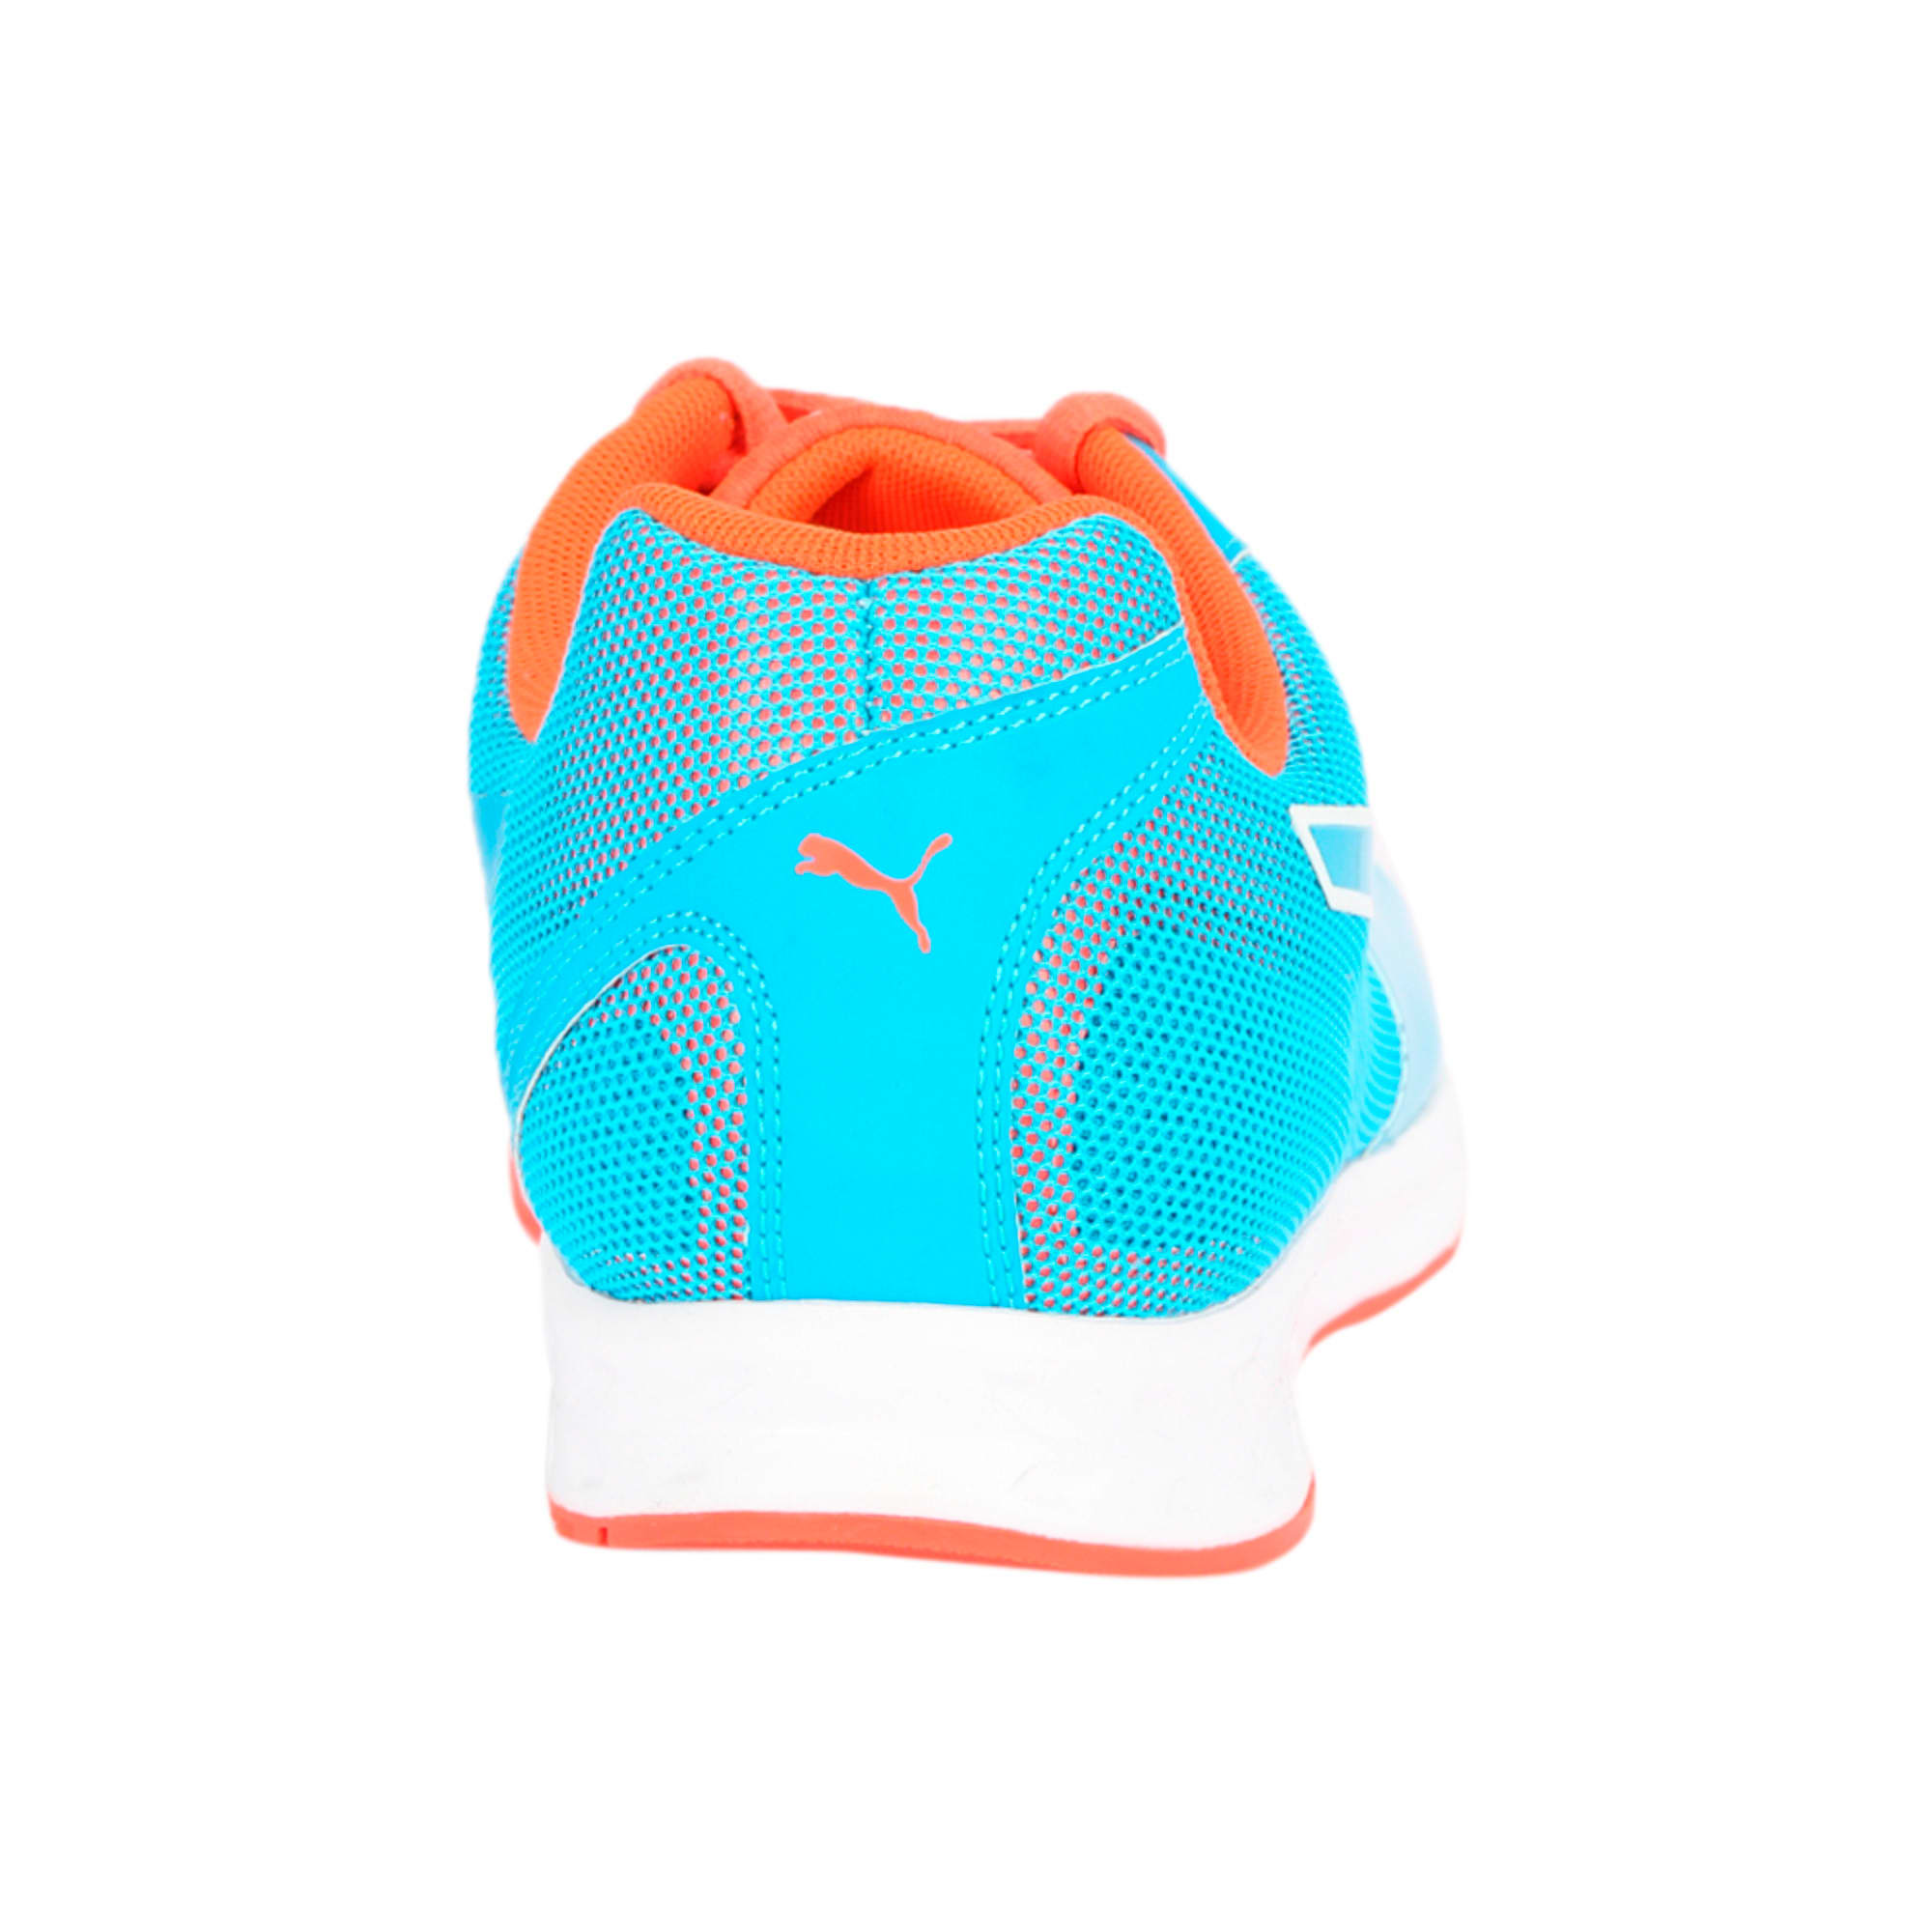 Thumbnail 4 of Burst Running Shoes, atomic blue-red blast, medium-IND